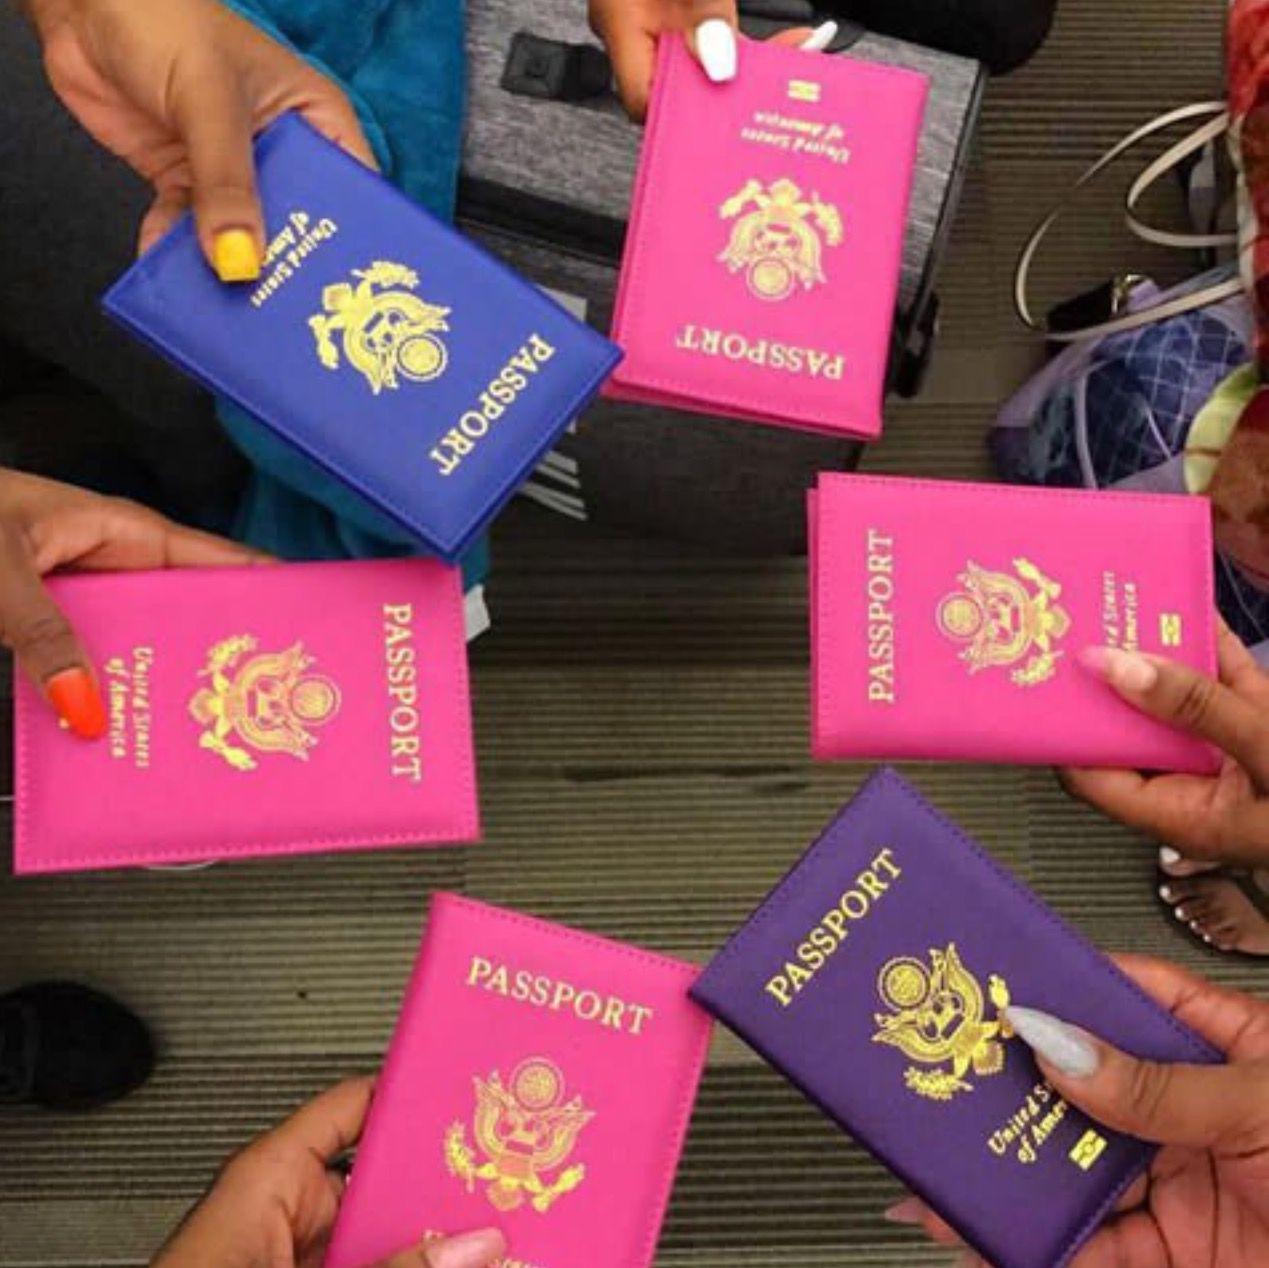 Passport Squad Goals PinterestNaturalb3auty Usa